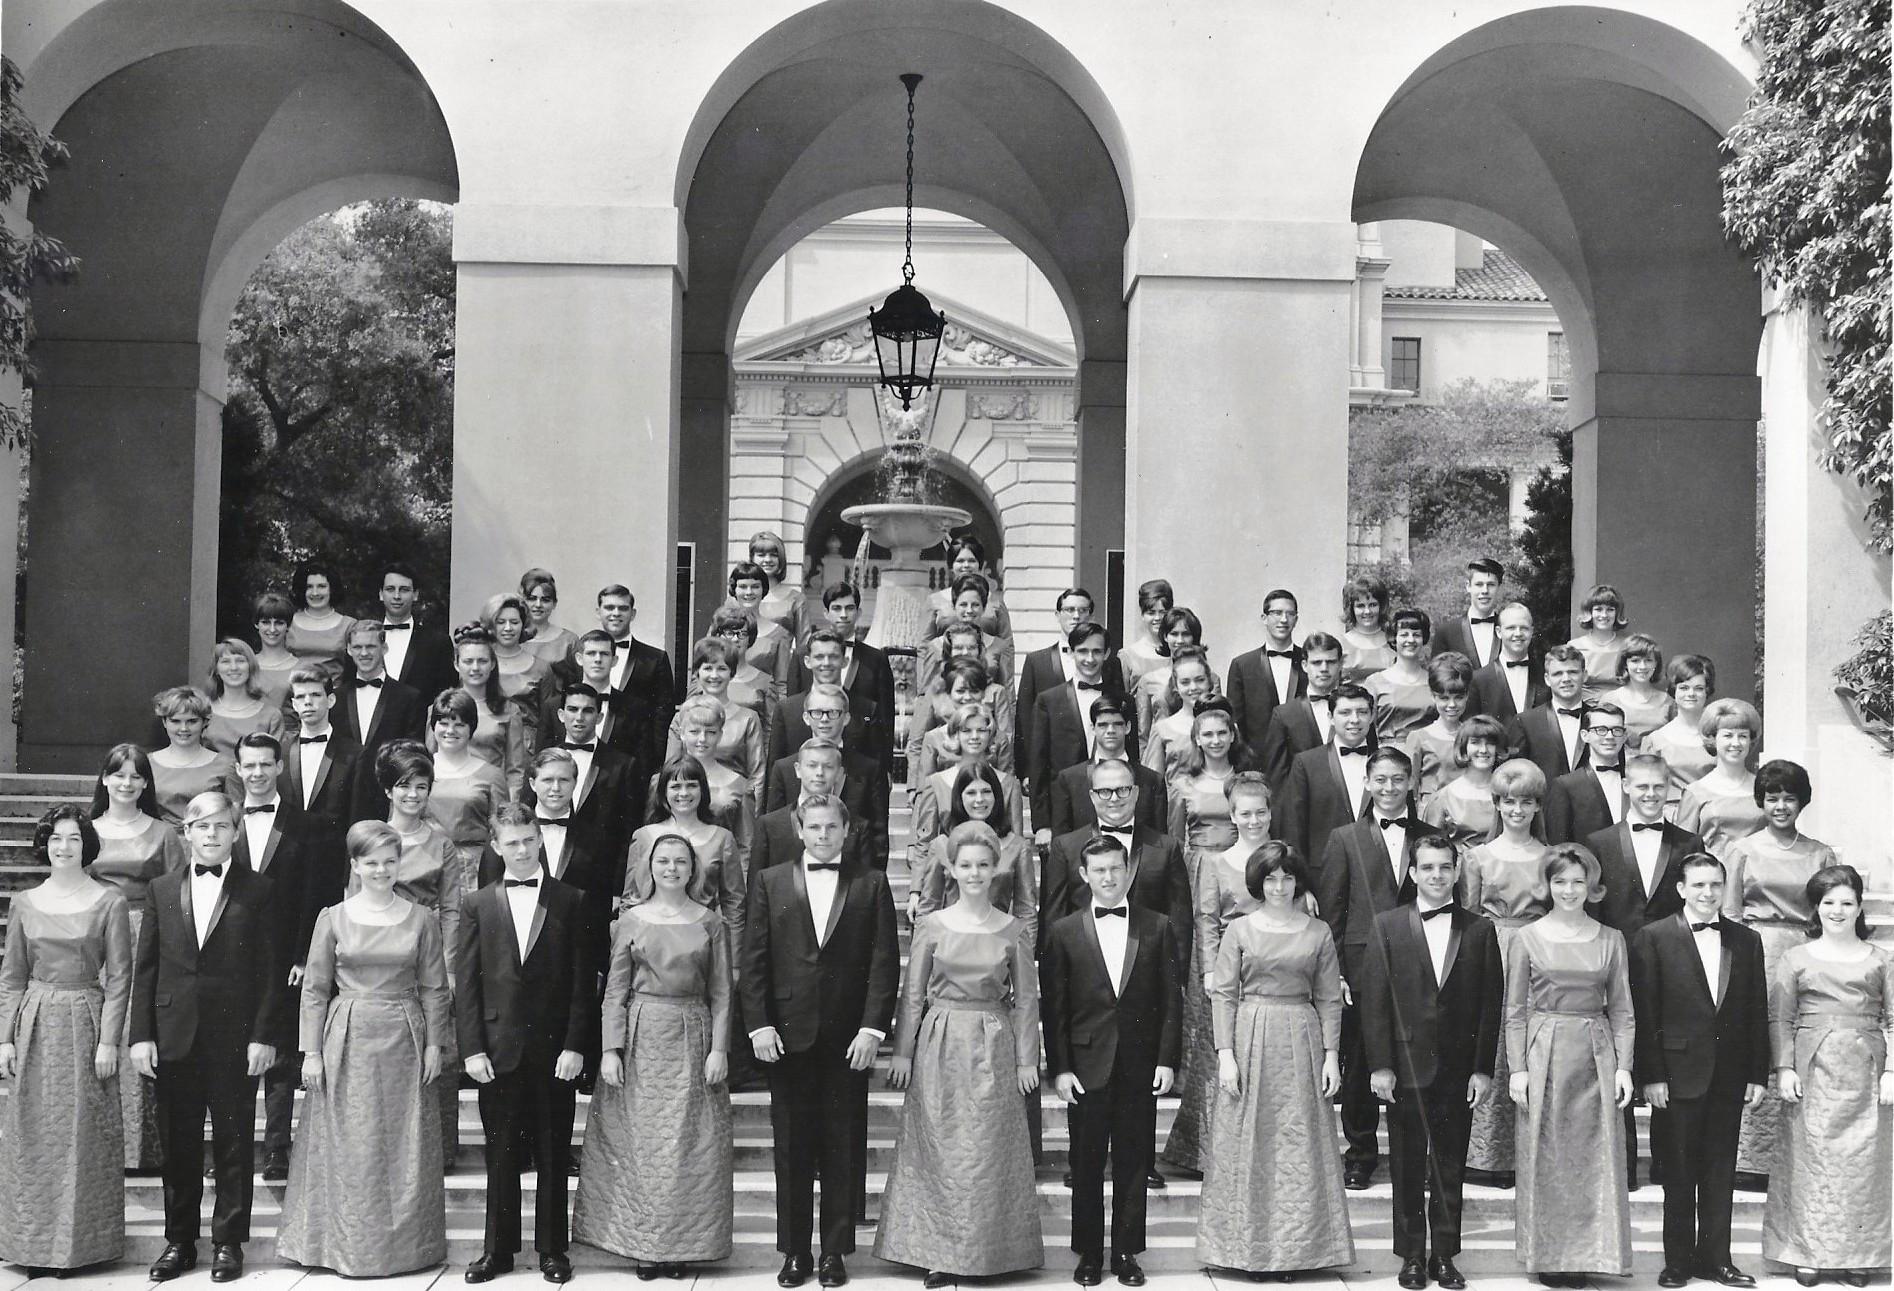 1966 – England, Norway, Sweden, Denmark, Germany, East and West Berlin, Czechoslovakia, Austria, Switzerland, France